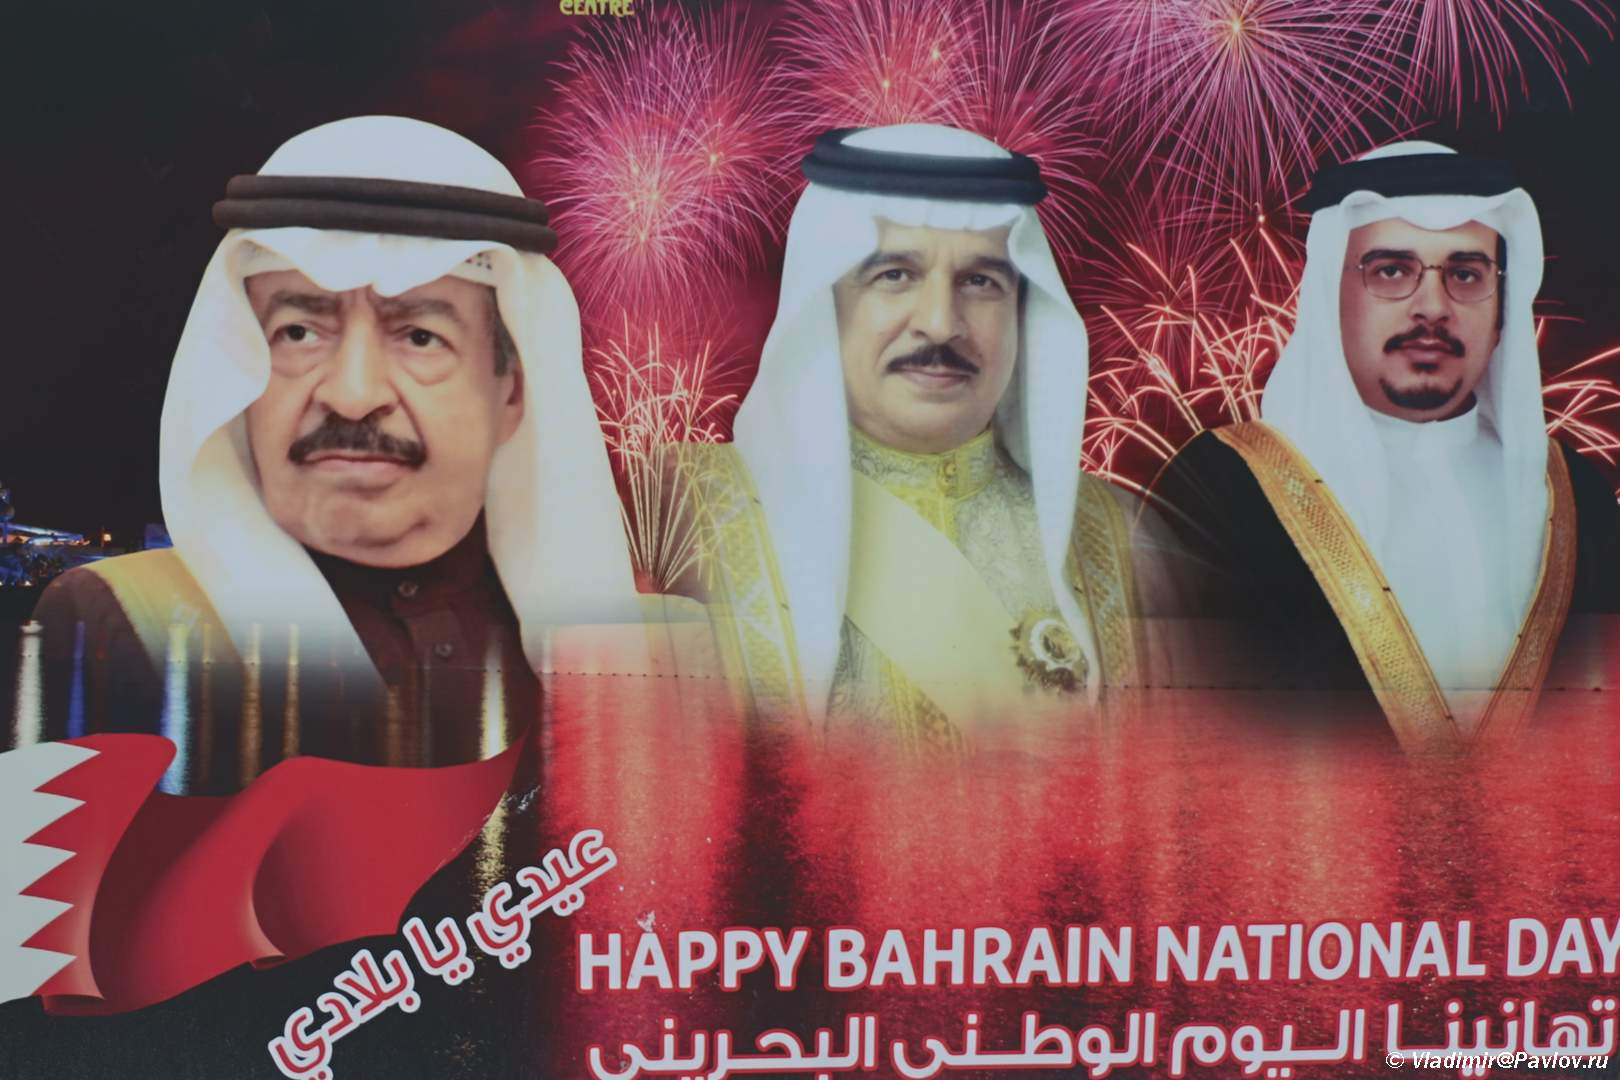 Pozdravleniya s Natsionalnym Dnem Bahrejna. Manama Bahrain - Национальный день Бахрейна. Bahrain National Day